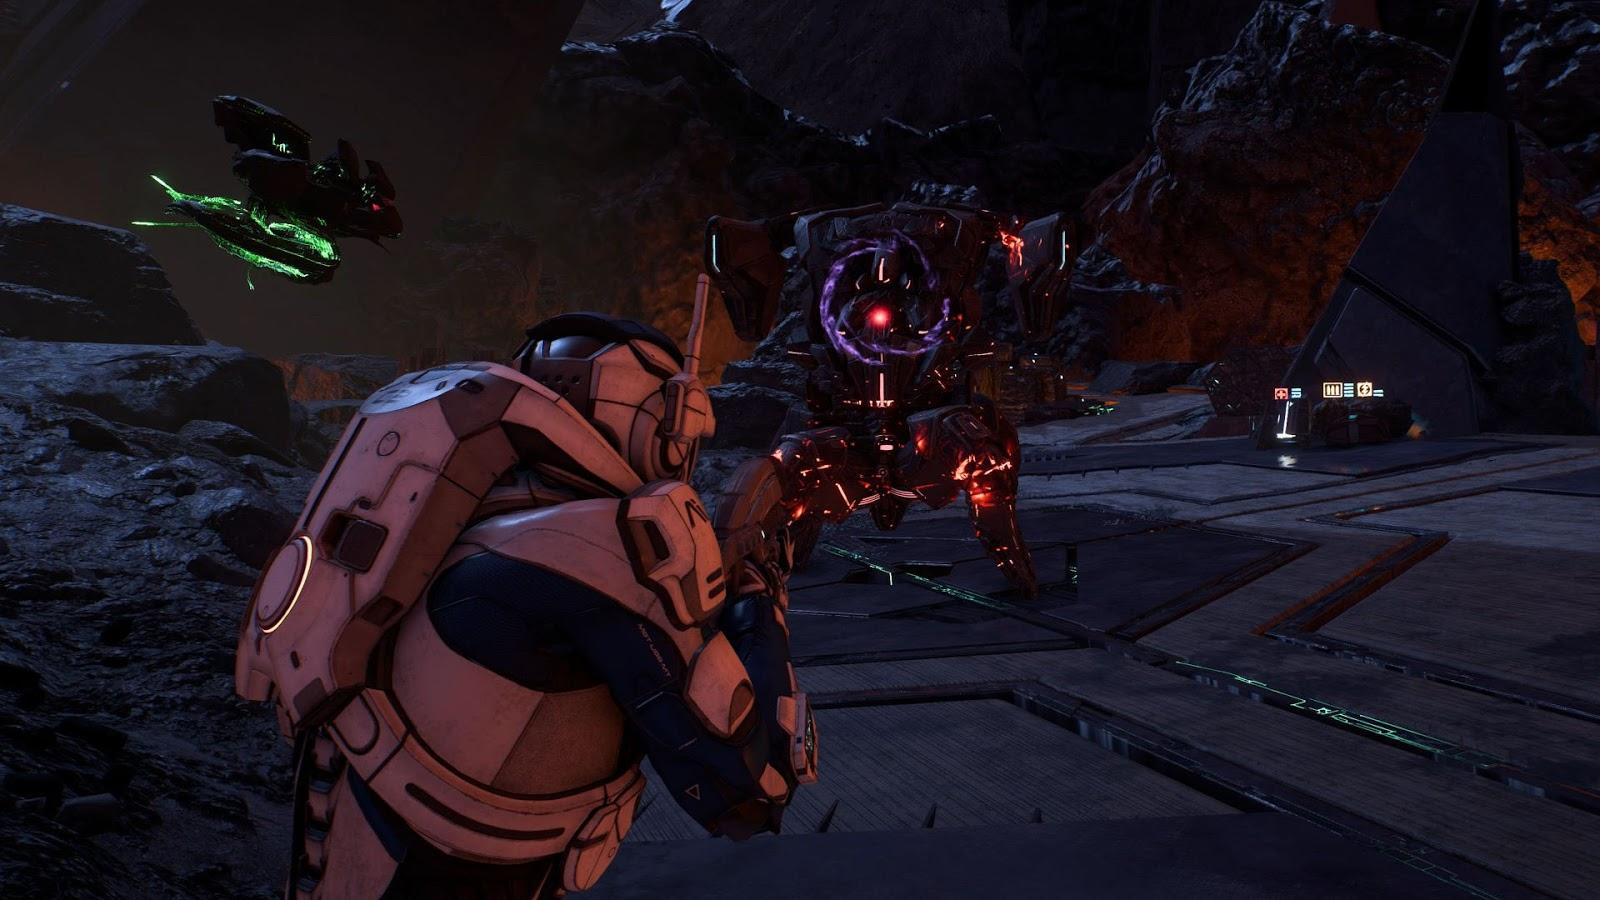 Mass Effect Andromeda ESPAÑOL PC Full + Update 1.0.0.5 + CRACKFIX (CPY) + REPACK PROPER 9 DVD5 (JPW) 1